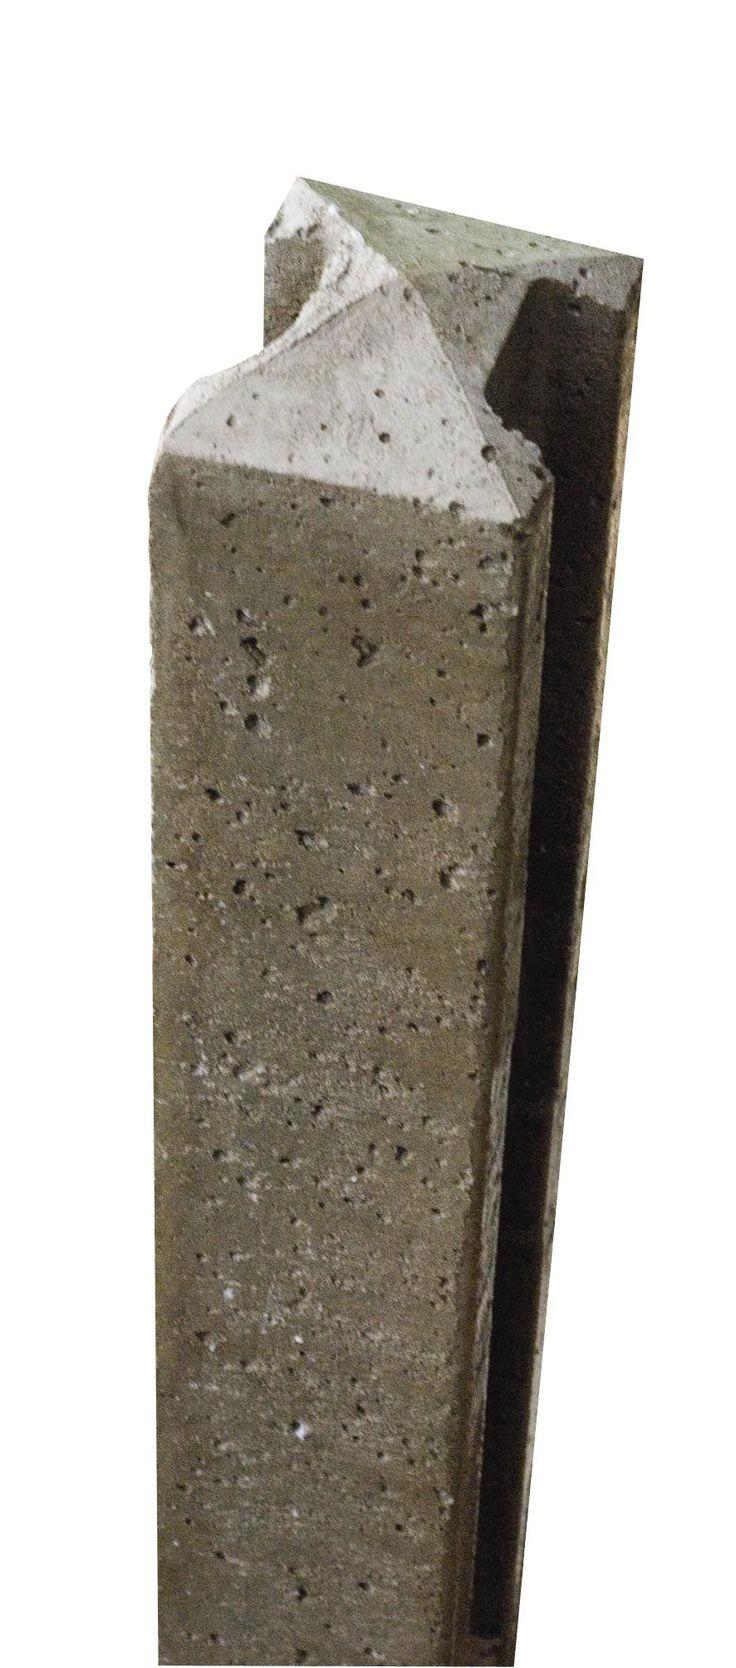 Grange Concrete Fence Post (H)1.75m